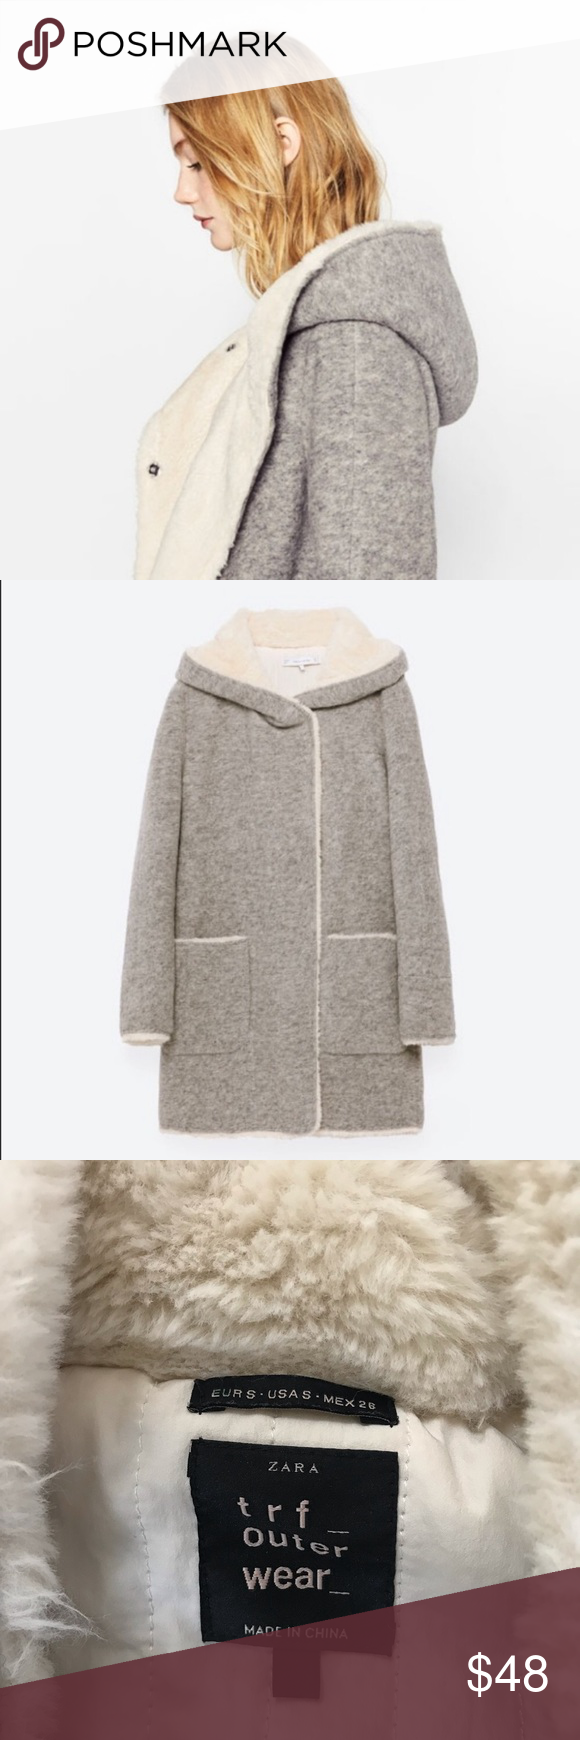 Zara Outerwear Wool Blend Coat Zara Outerwear Wool Blend [ 1740 x 580 Pixel ]